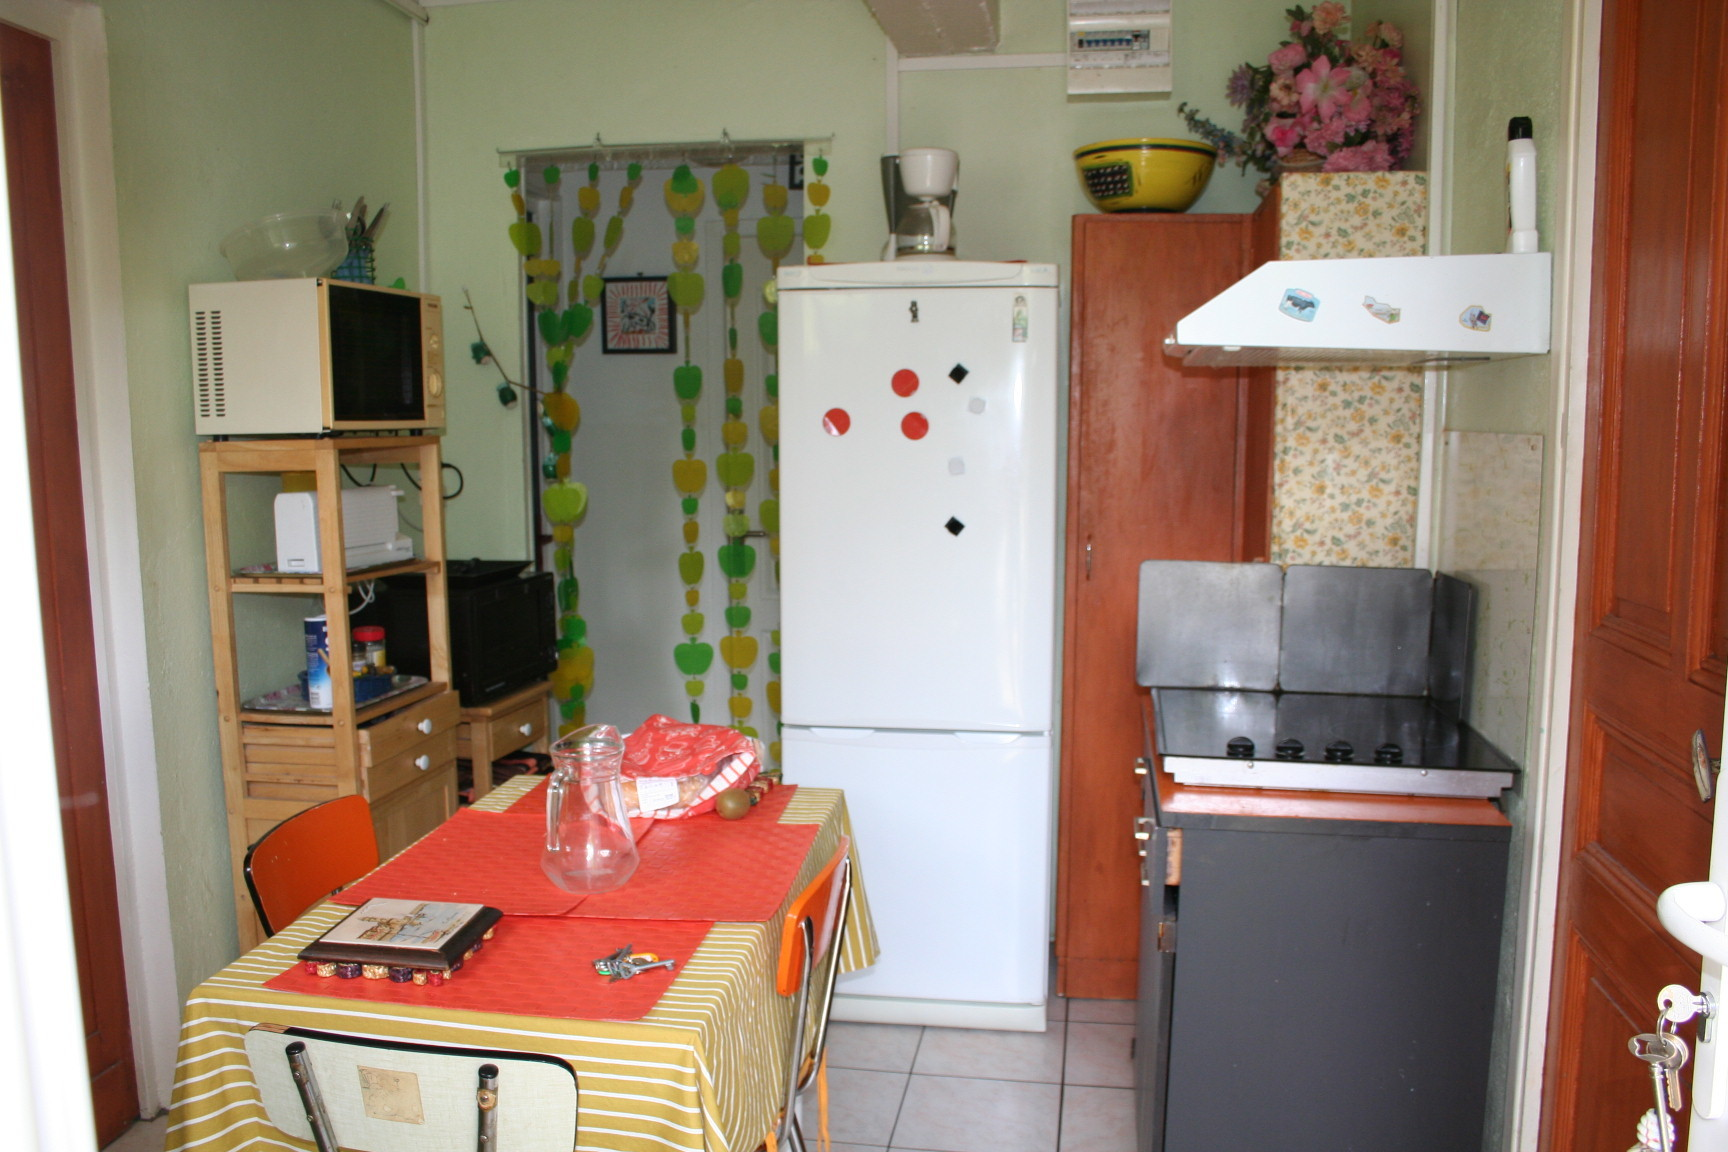 Chambre Meublee Independante Avec Sdb - Cuisine Meublee Quartier